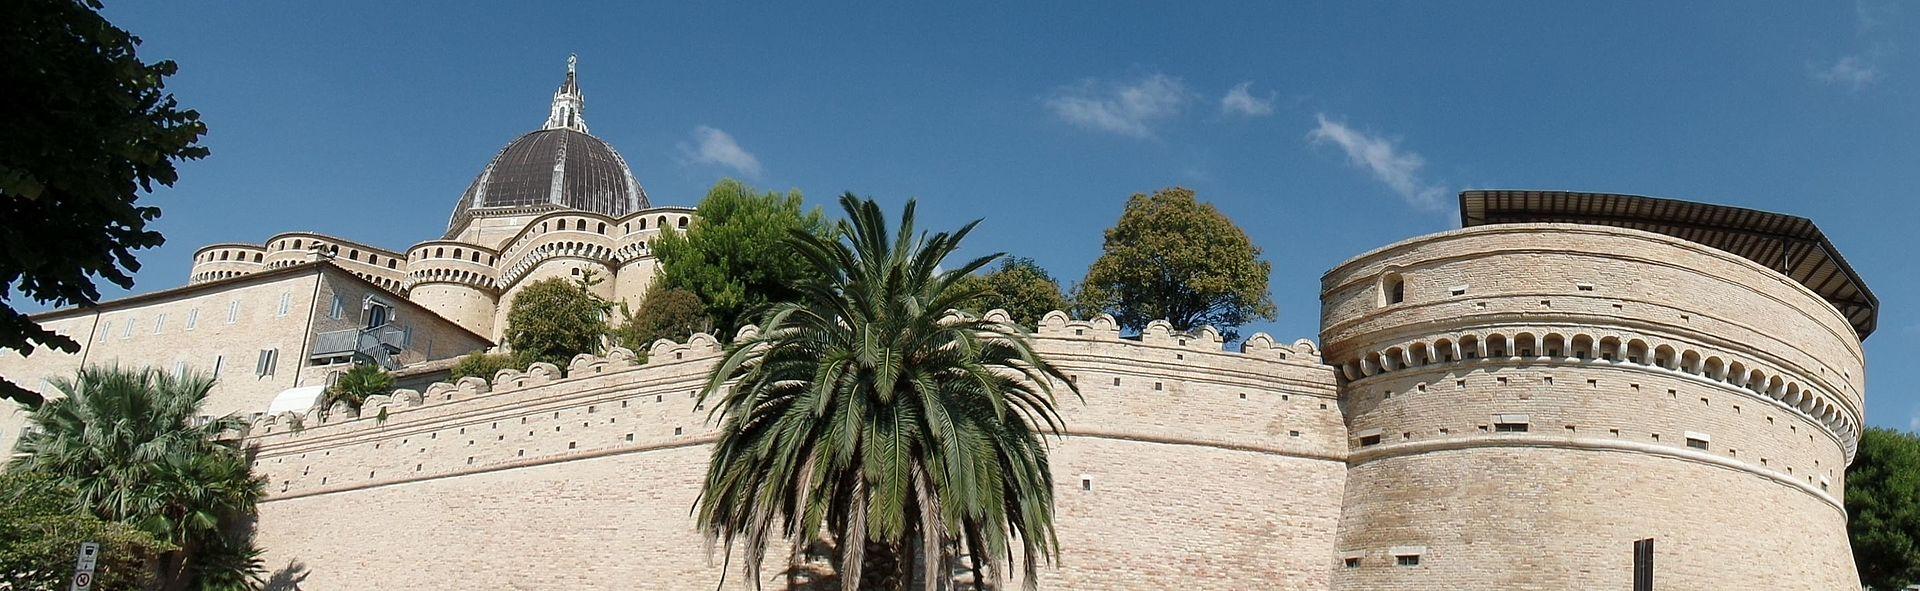 Basilica Loreto vista con Torrione.jpg